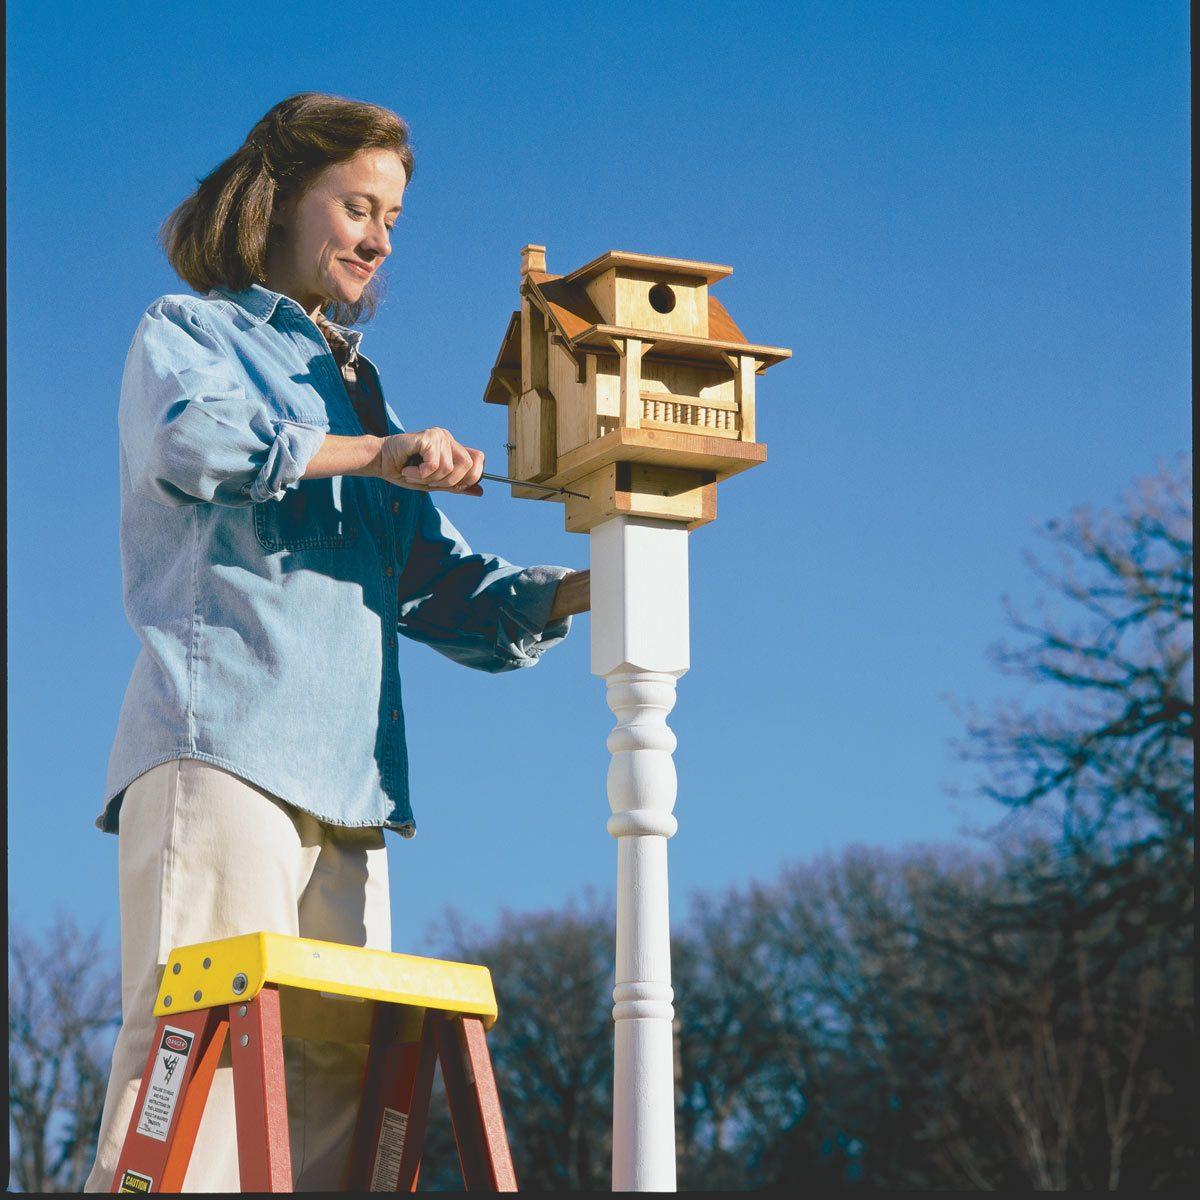 Build a Birdhouse